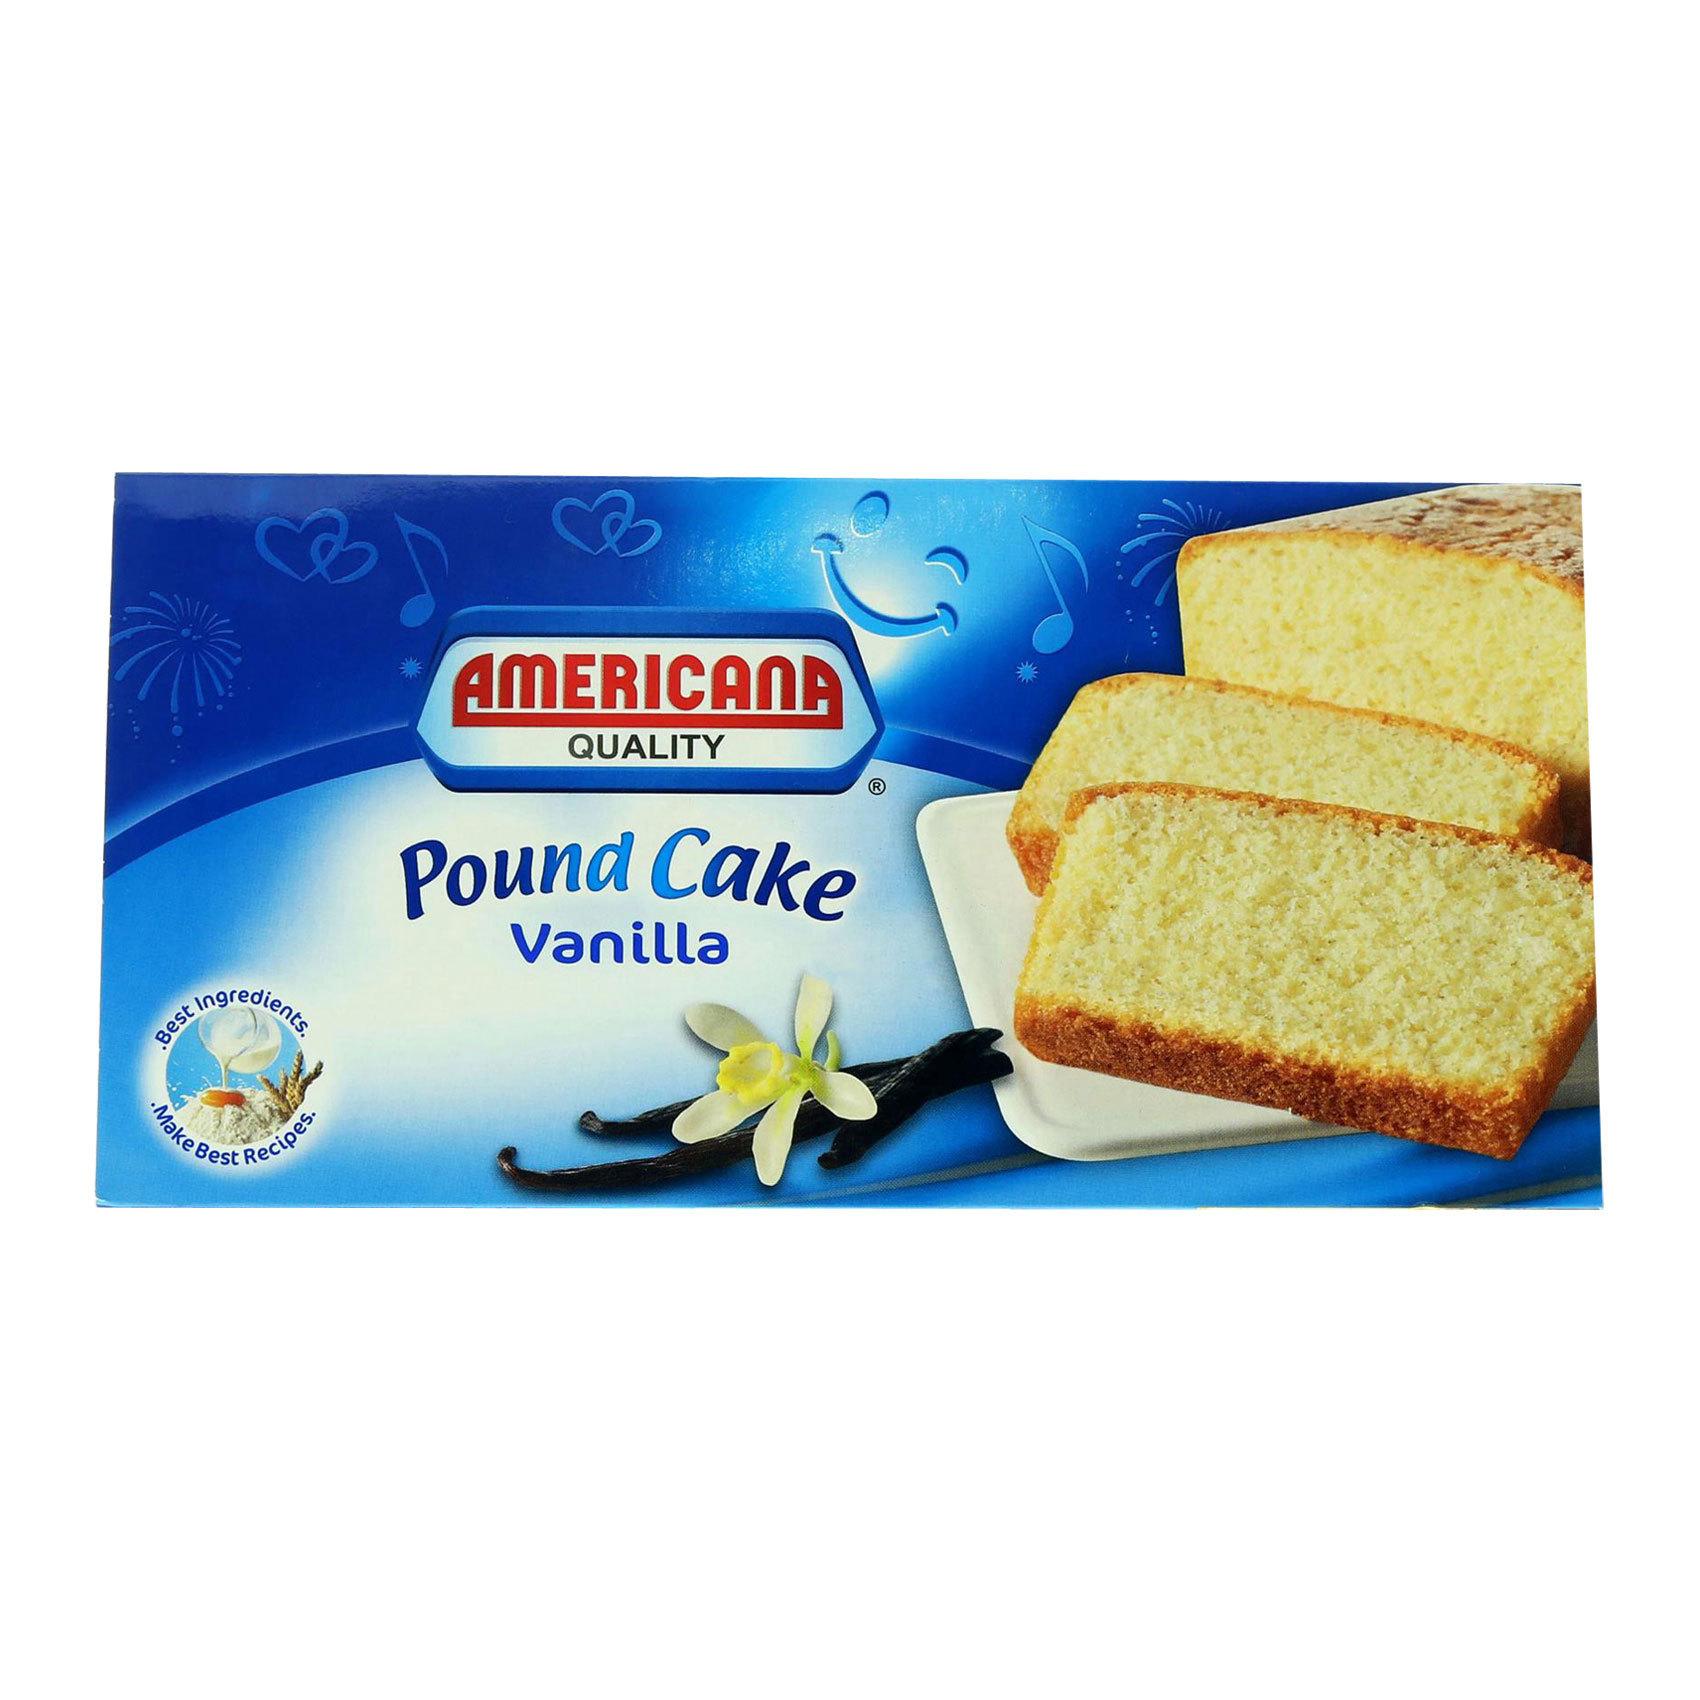 AMERICANA POUND CAKE VAN 295G